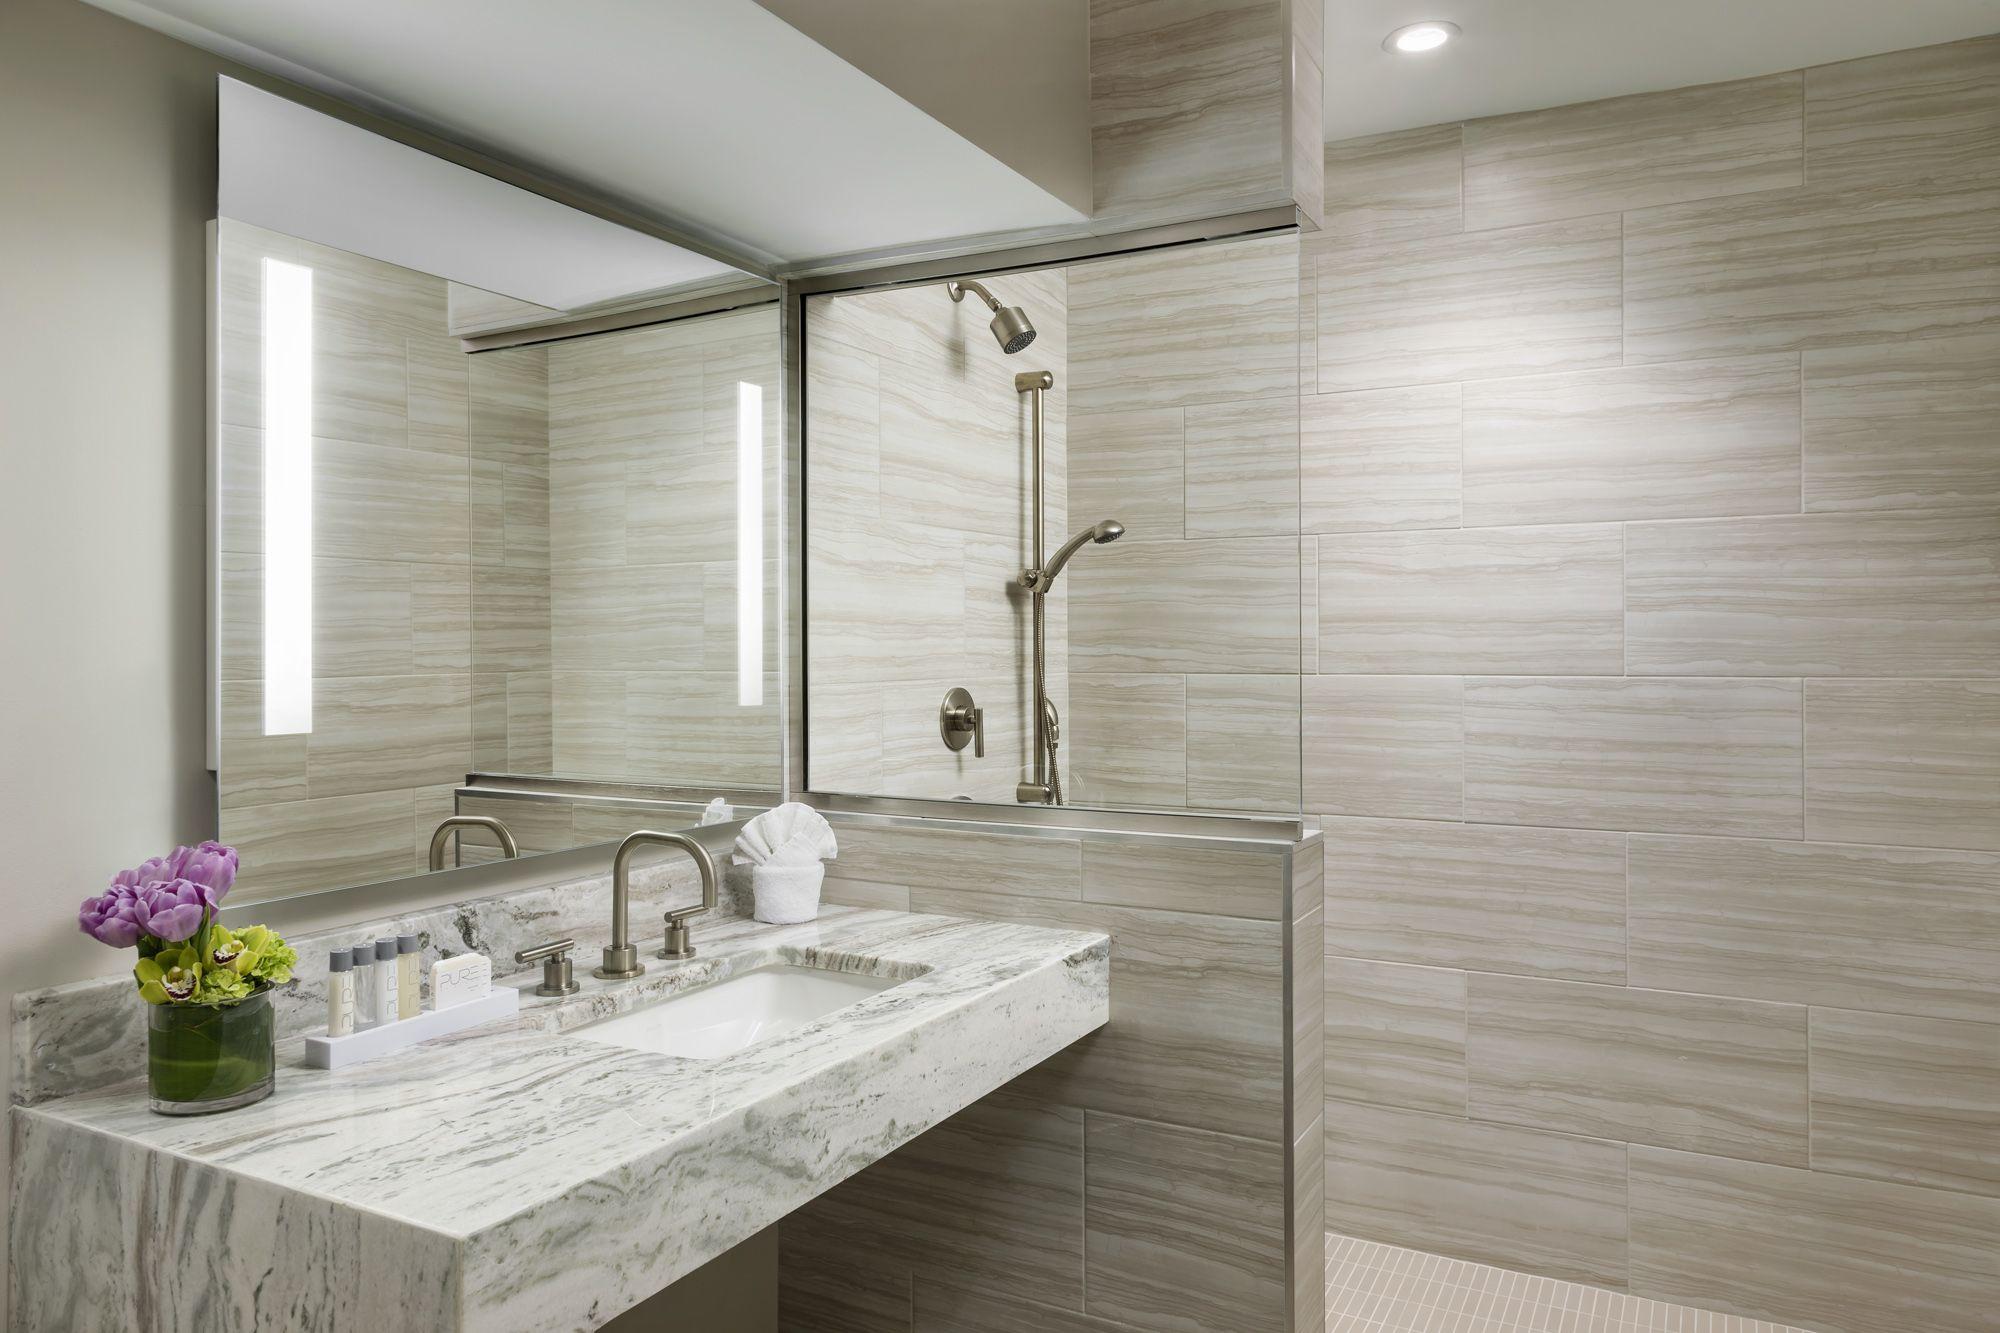 Walk In Shower In The Garden Suite At Boston Park Plaza Garden Suite Boston Hotels Hotels Room